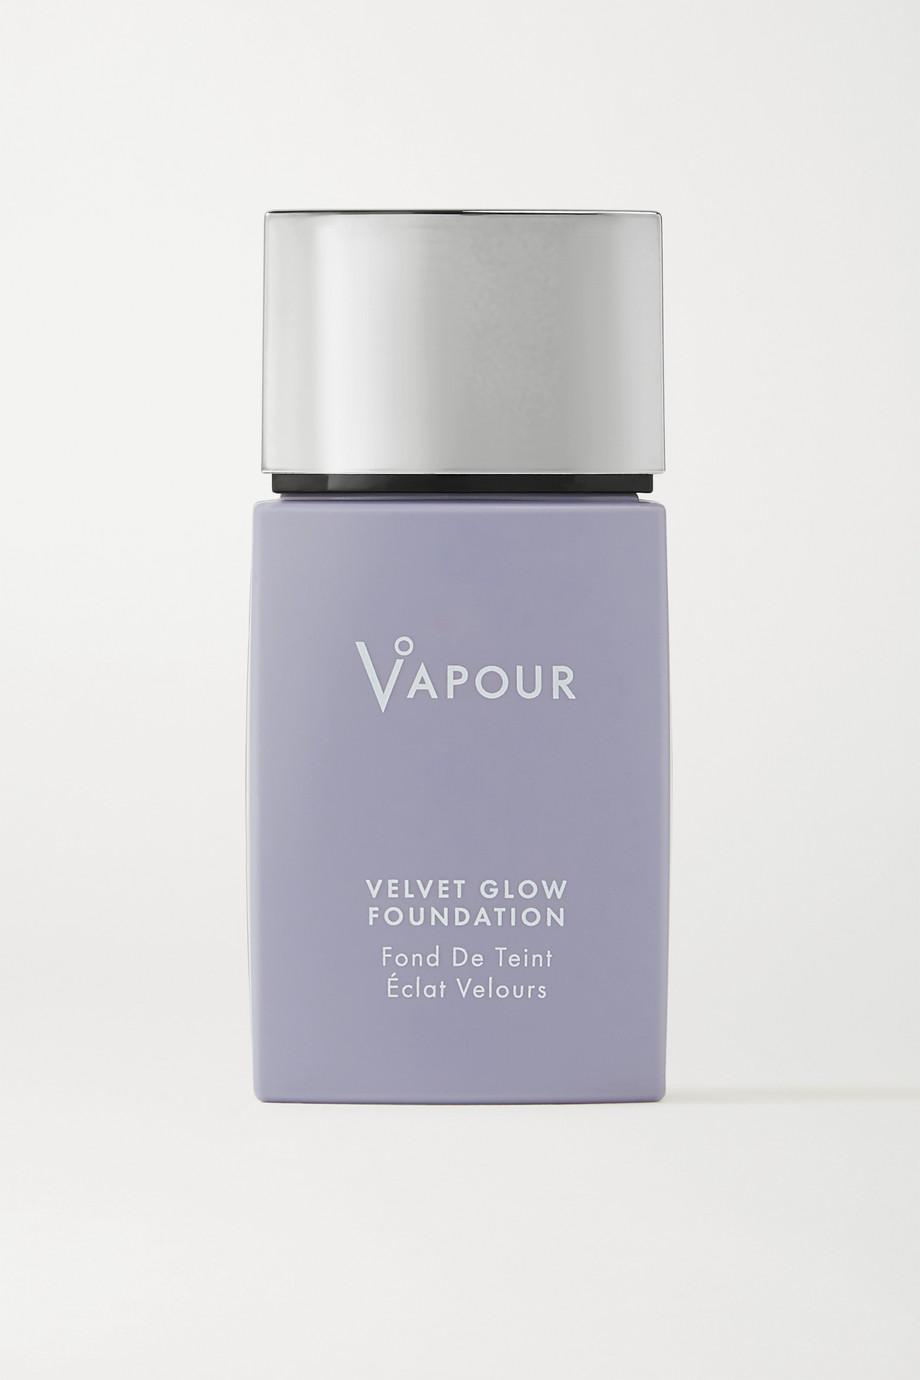 Vapour Beauty 丝绒润泽粉底液,30ml(色号:120V)